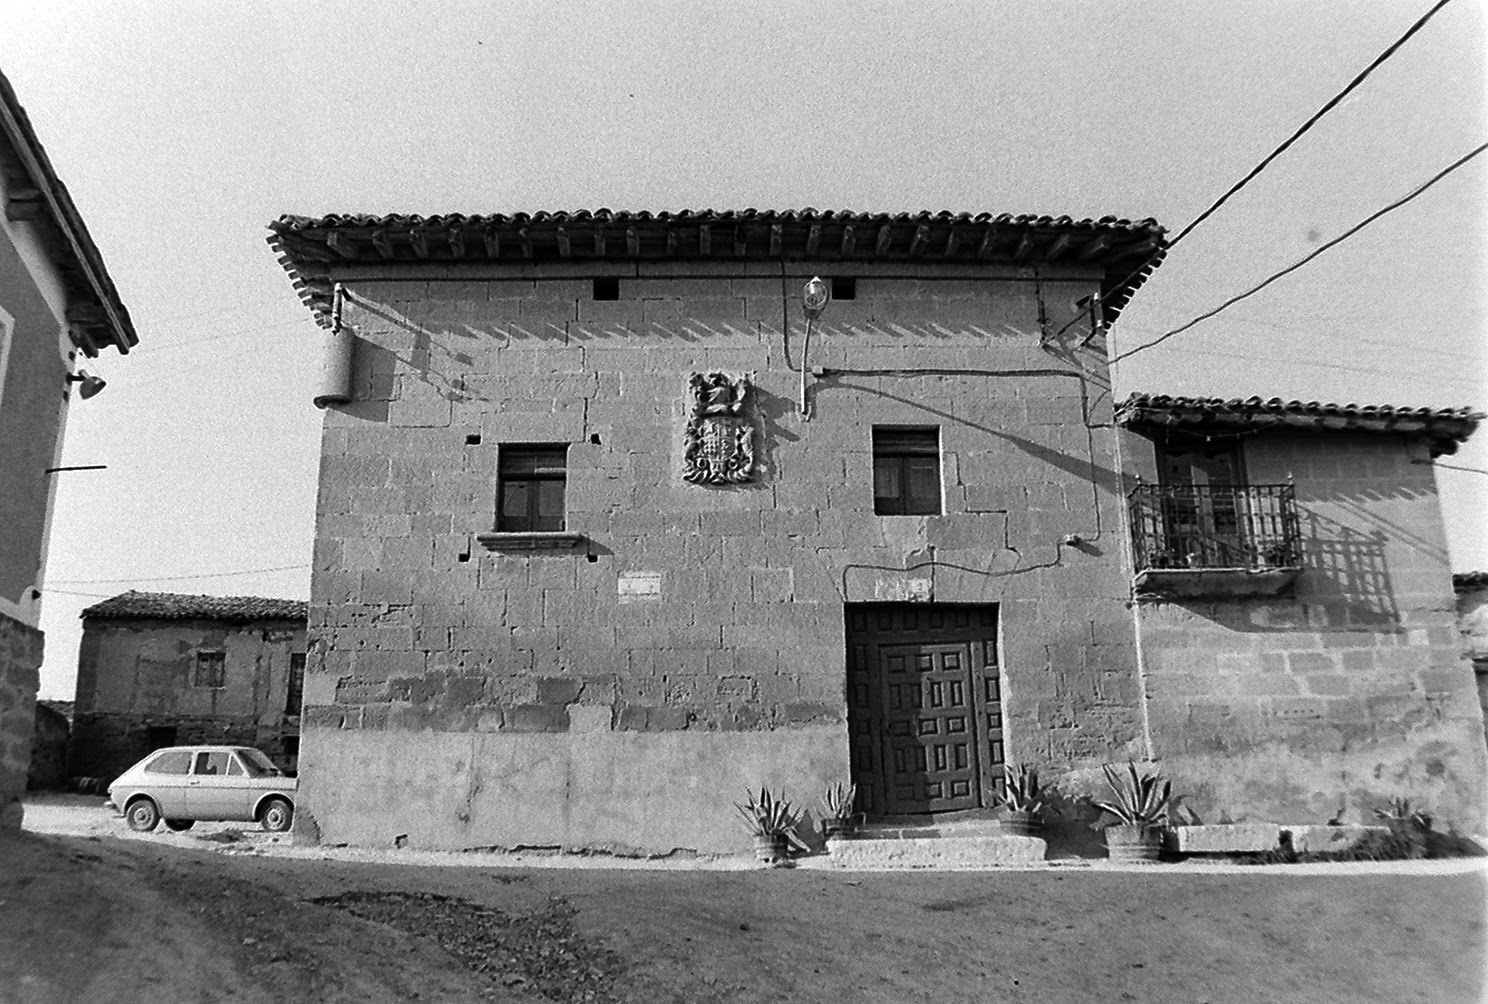 Casas solariegas en la rioja 160 gimileo i calle san mart n 1 - Casa de san martin ...